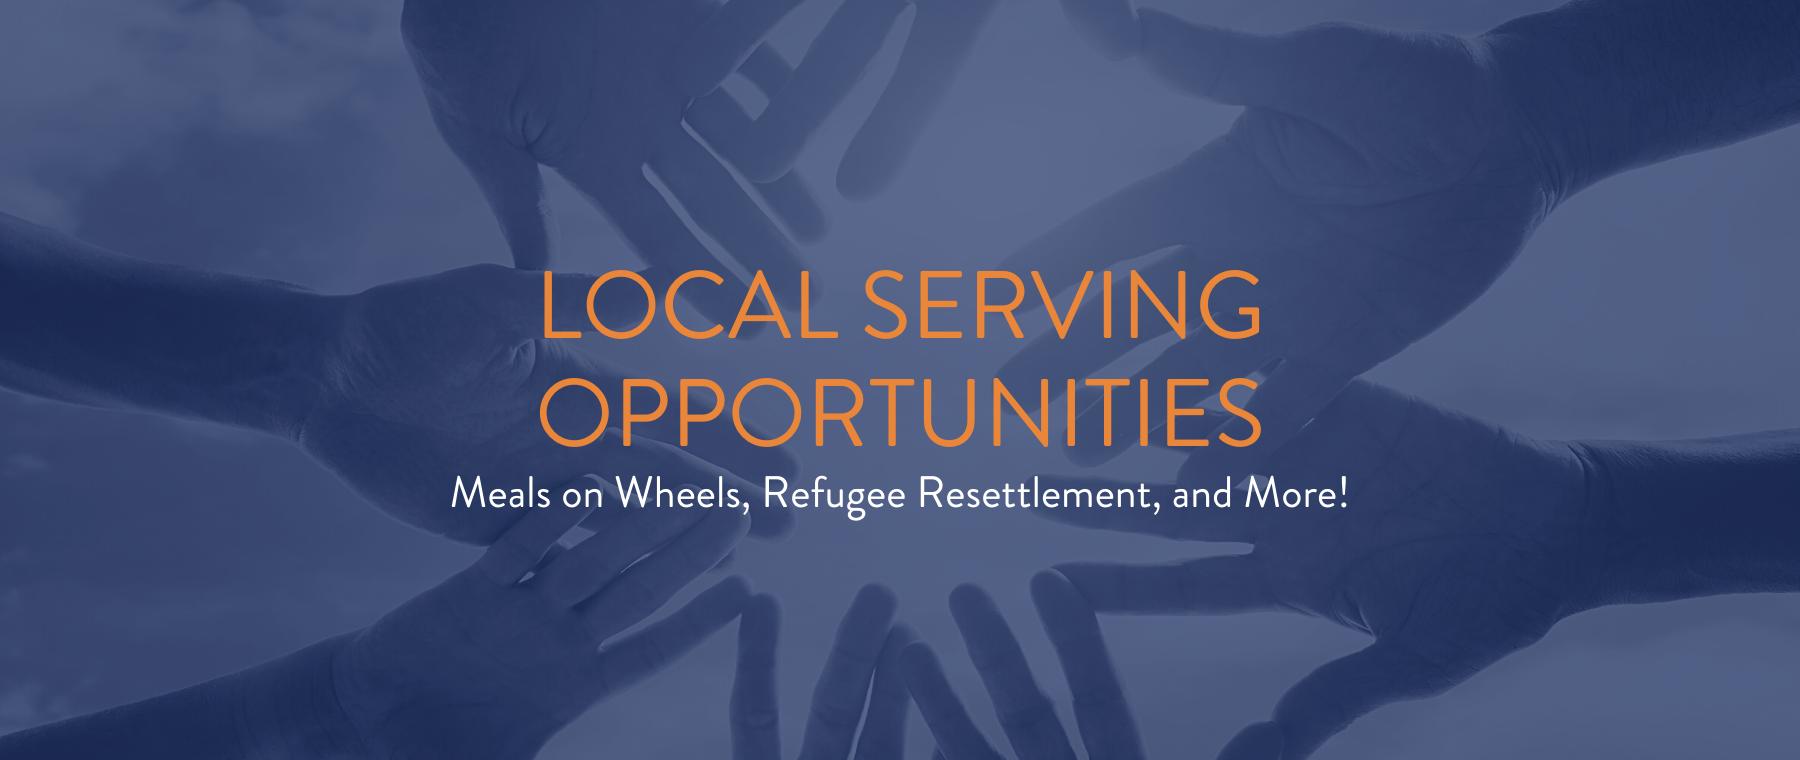 Serve Locally